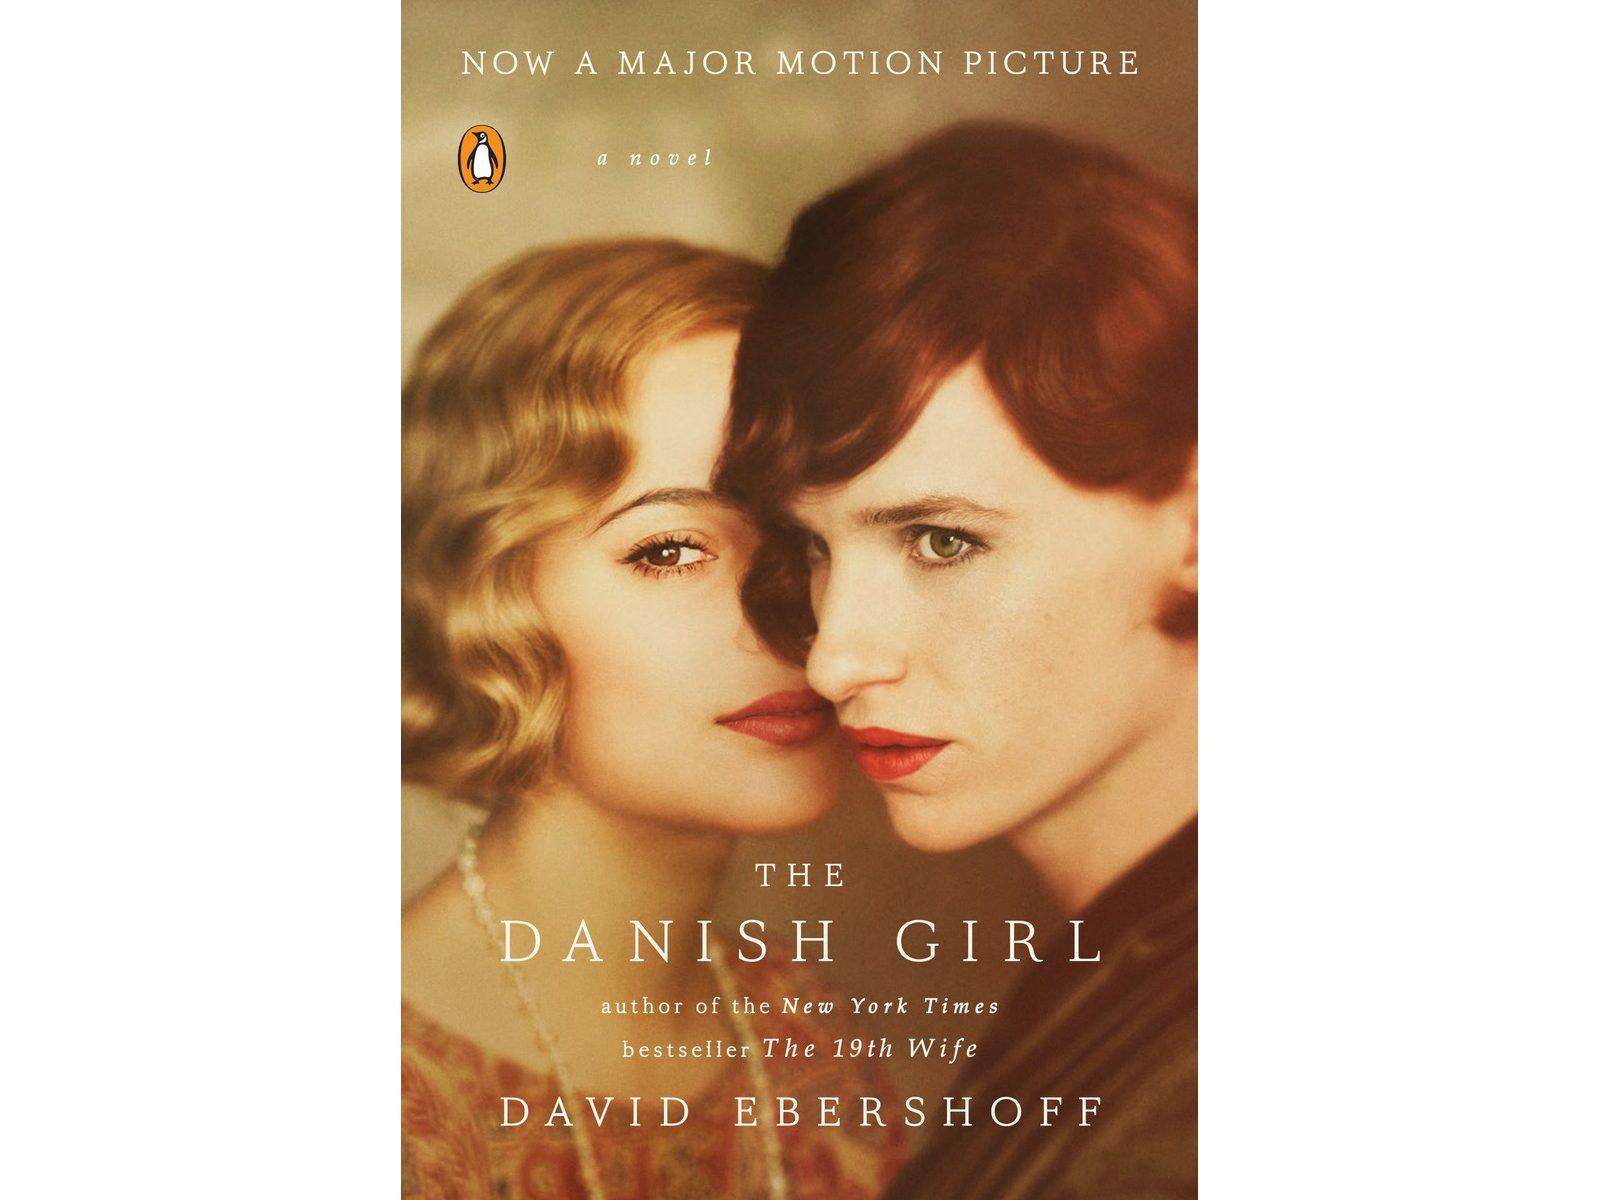 6. The Danish Girl by David Ebershoff